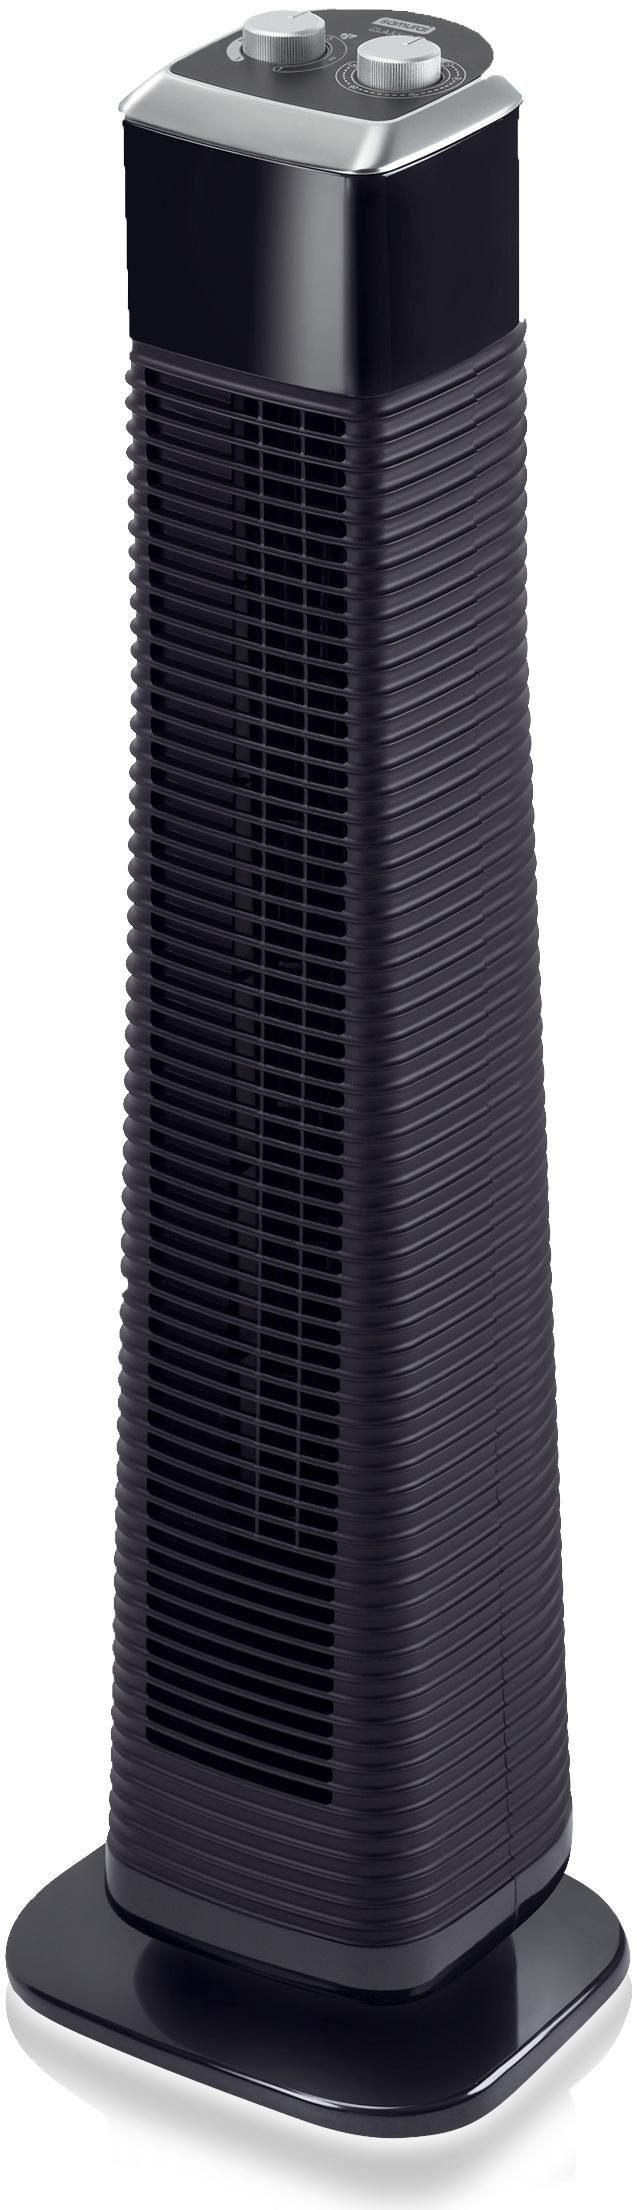 Rowenta Turmventilator CLASSIC TOWER VU6140, schwarz-silber